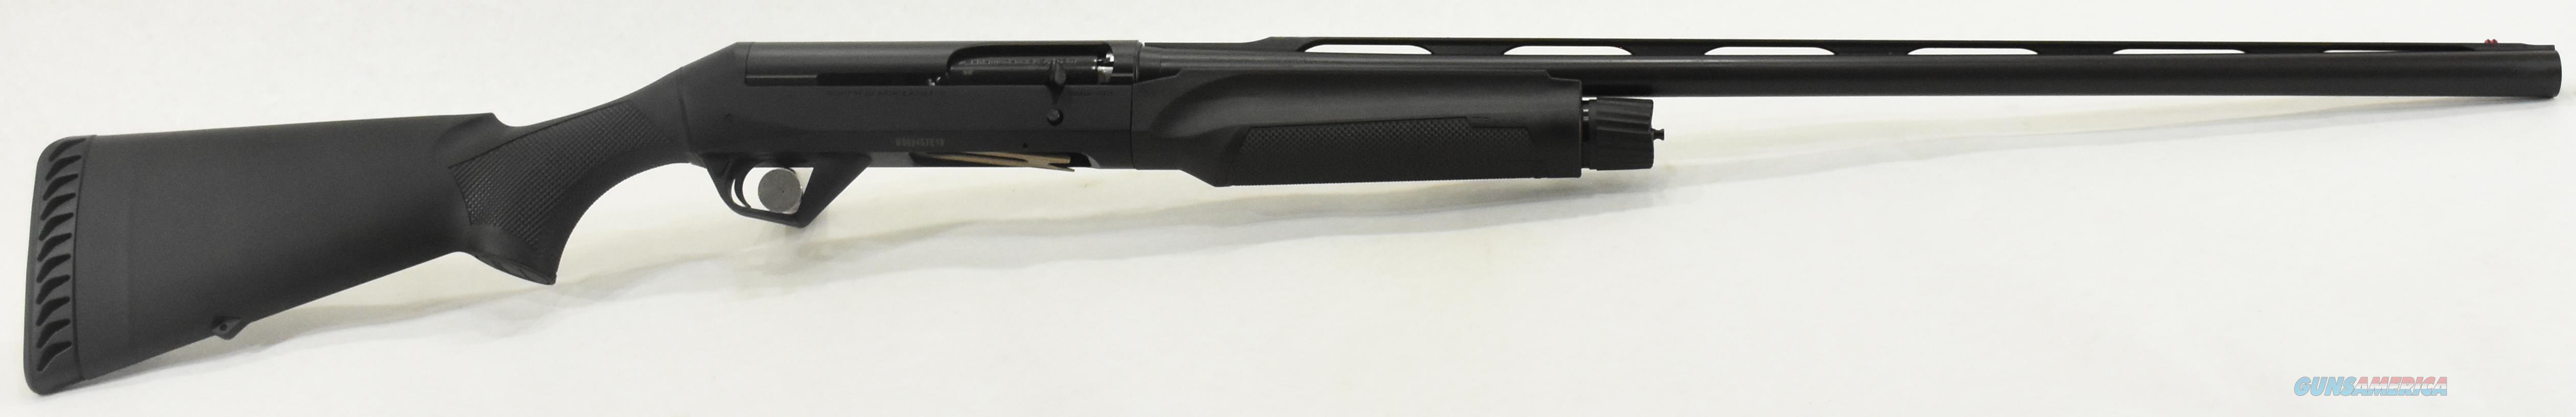 11119 Benelli Super Black Eagle Classic 12 Ga 28-3.5In  Guns > Shotguns > Benelli Shotguns > Sporting